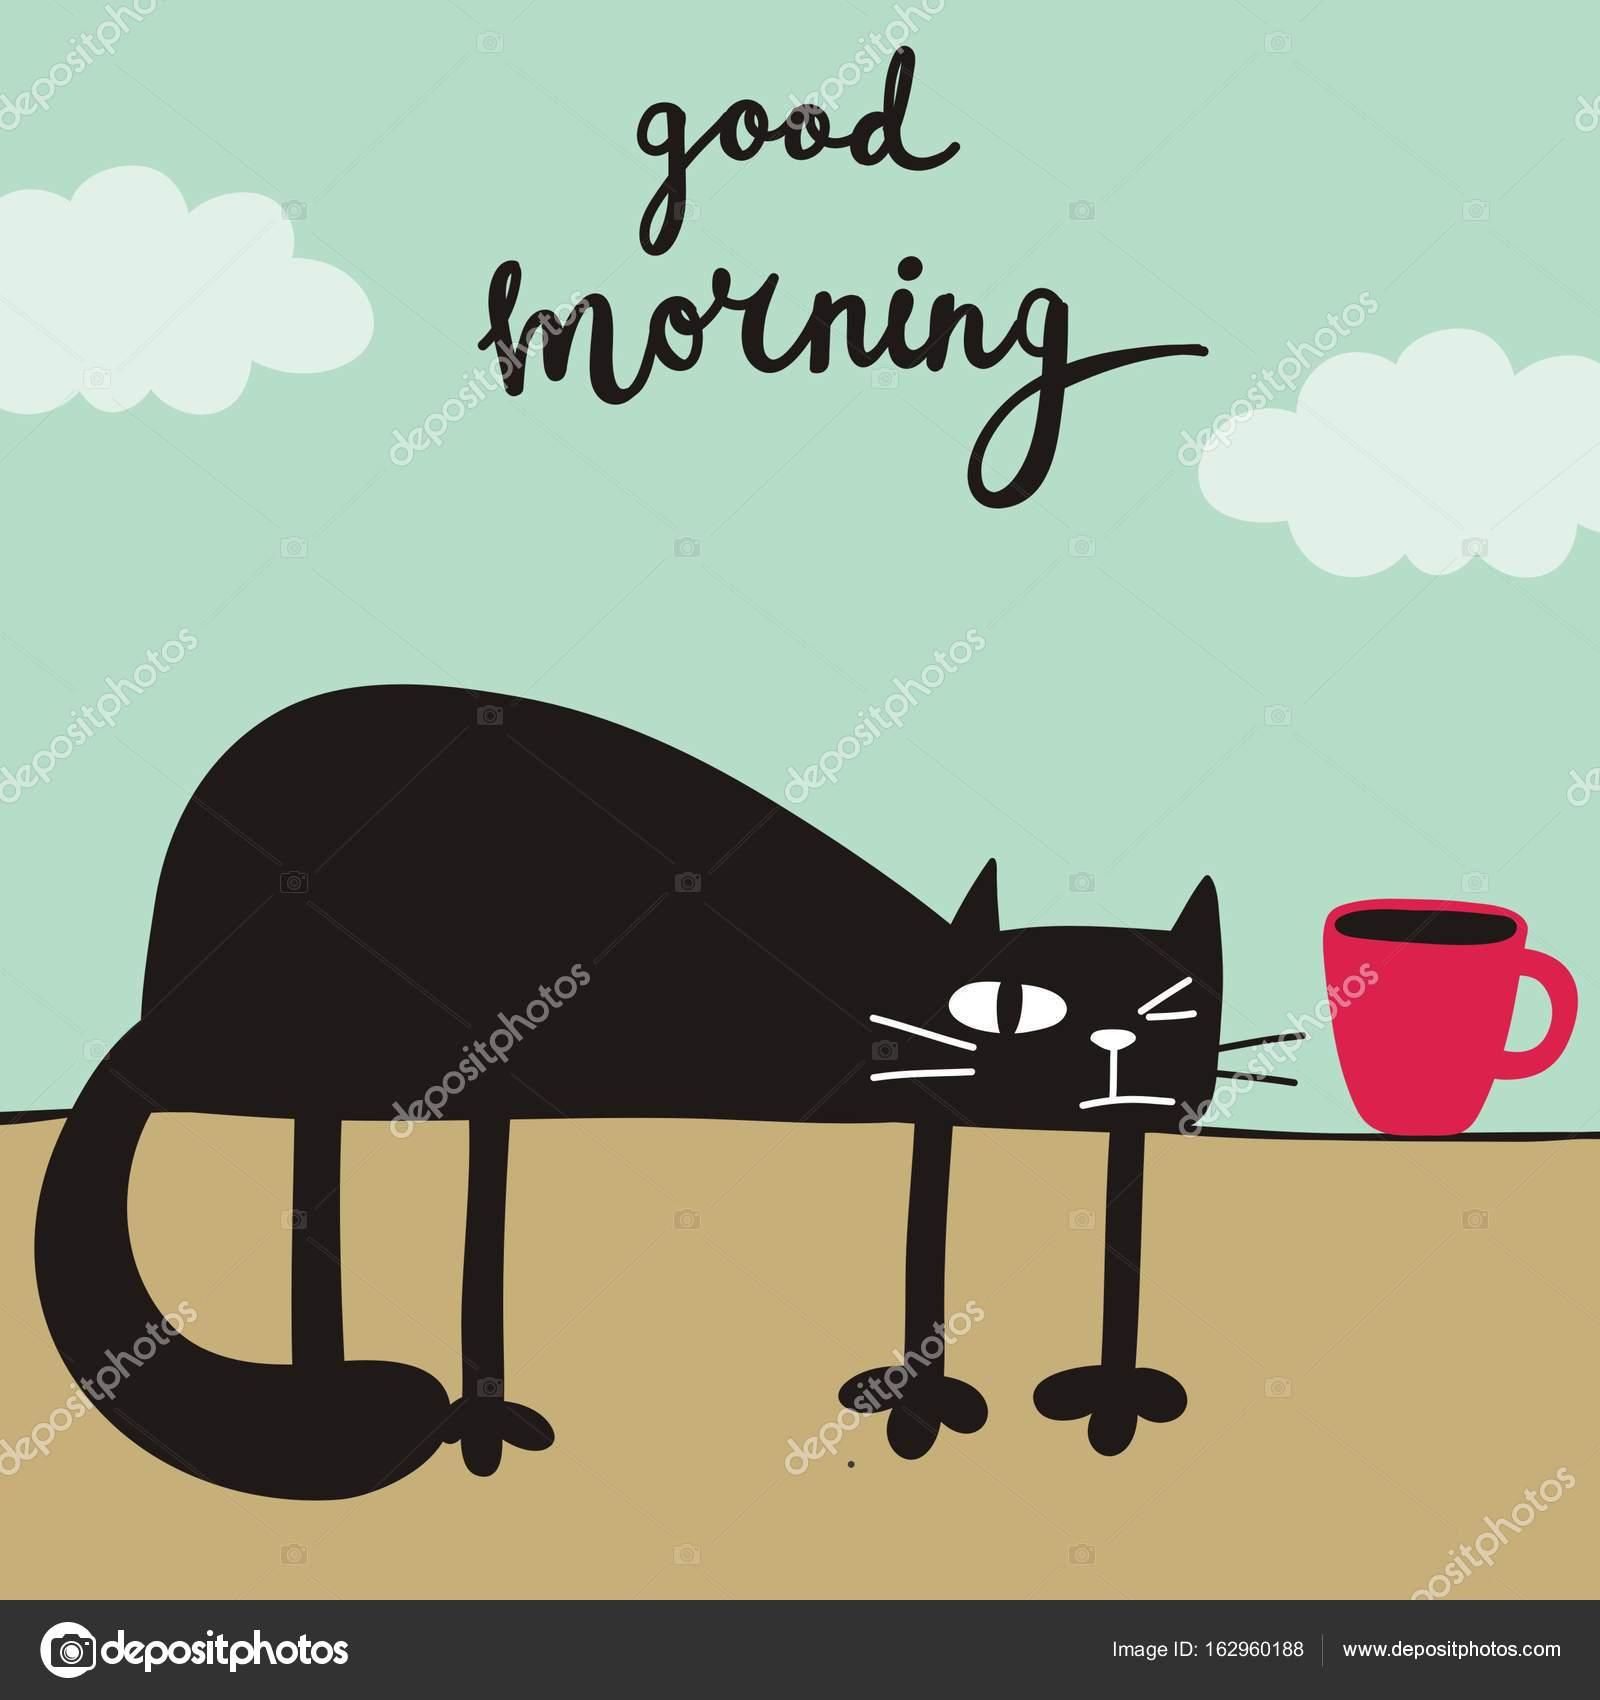 Funny Cartoon Cat Print Stock Vector C Webmuza 162960188